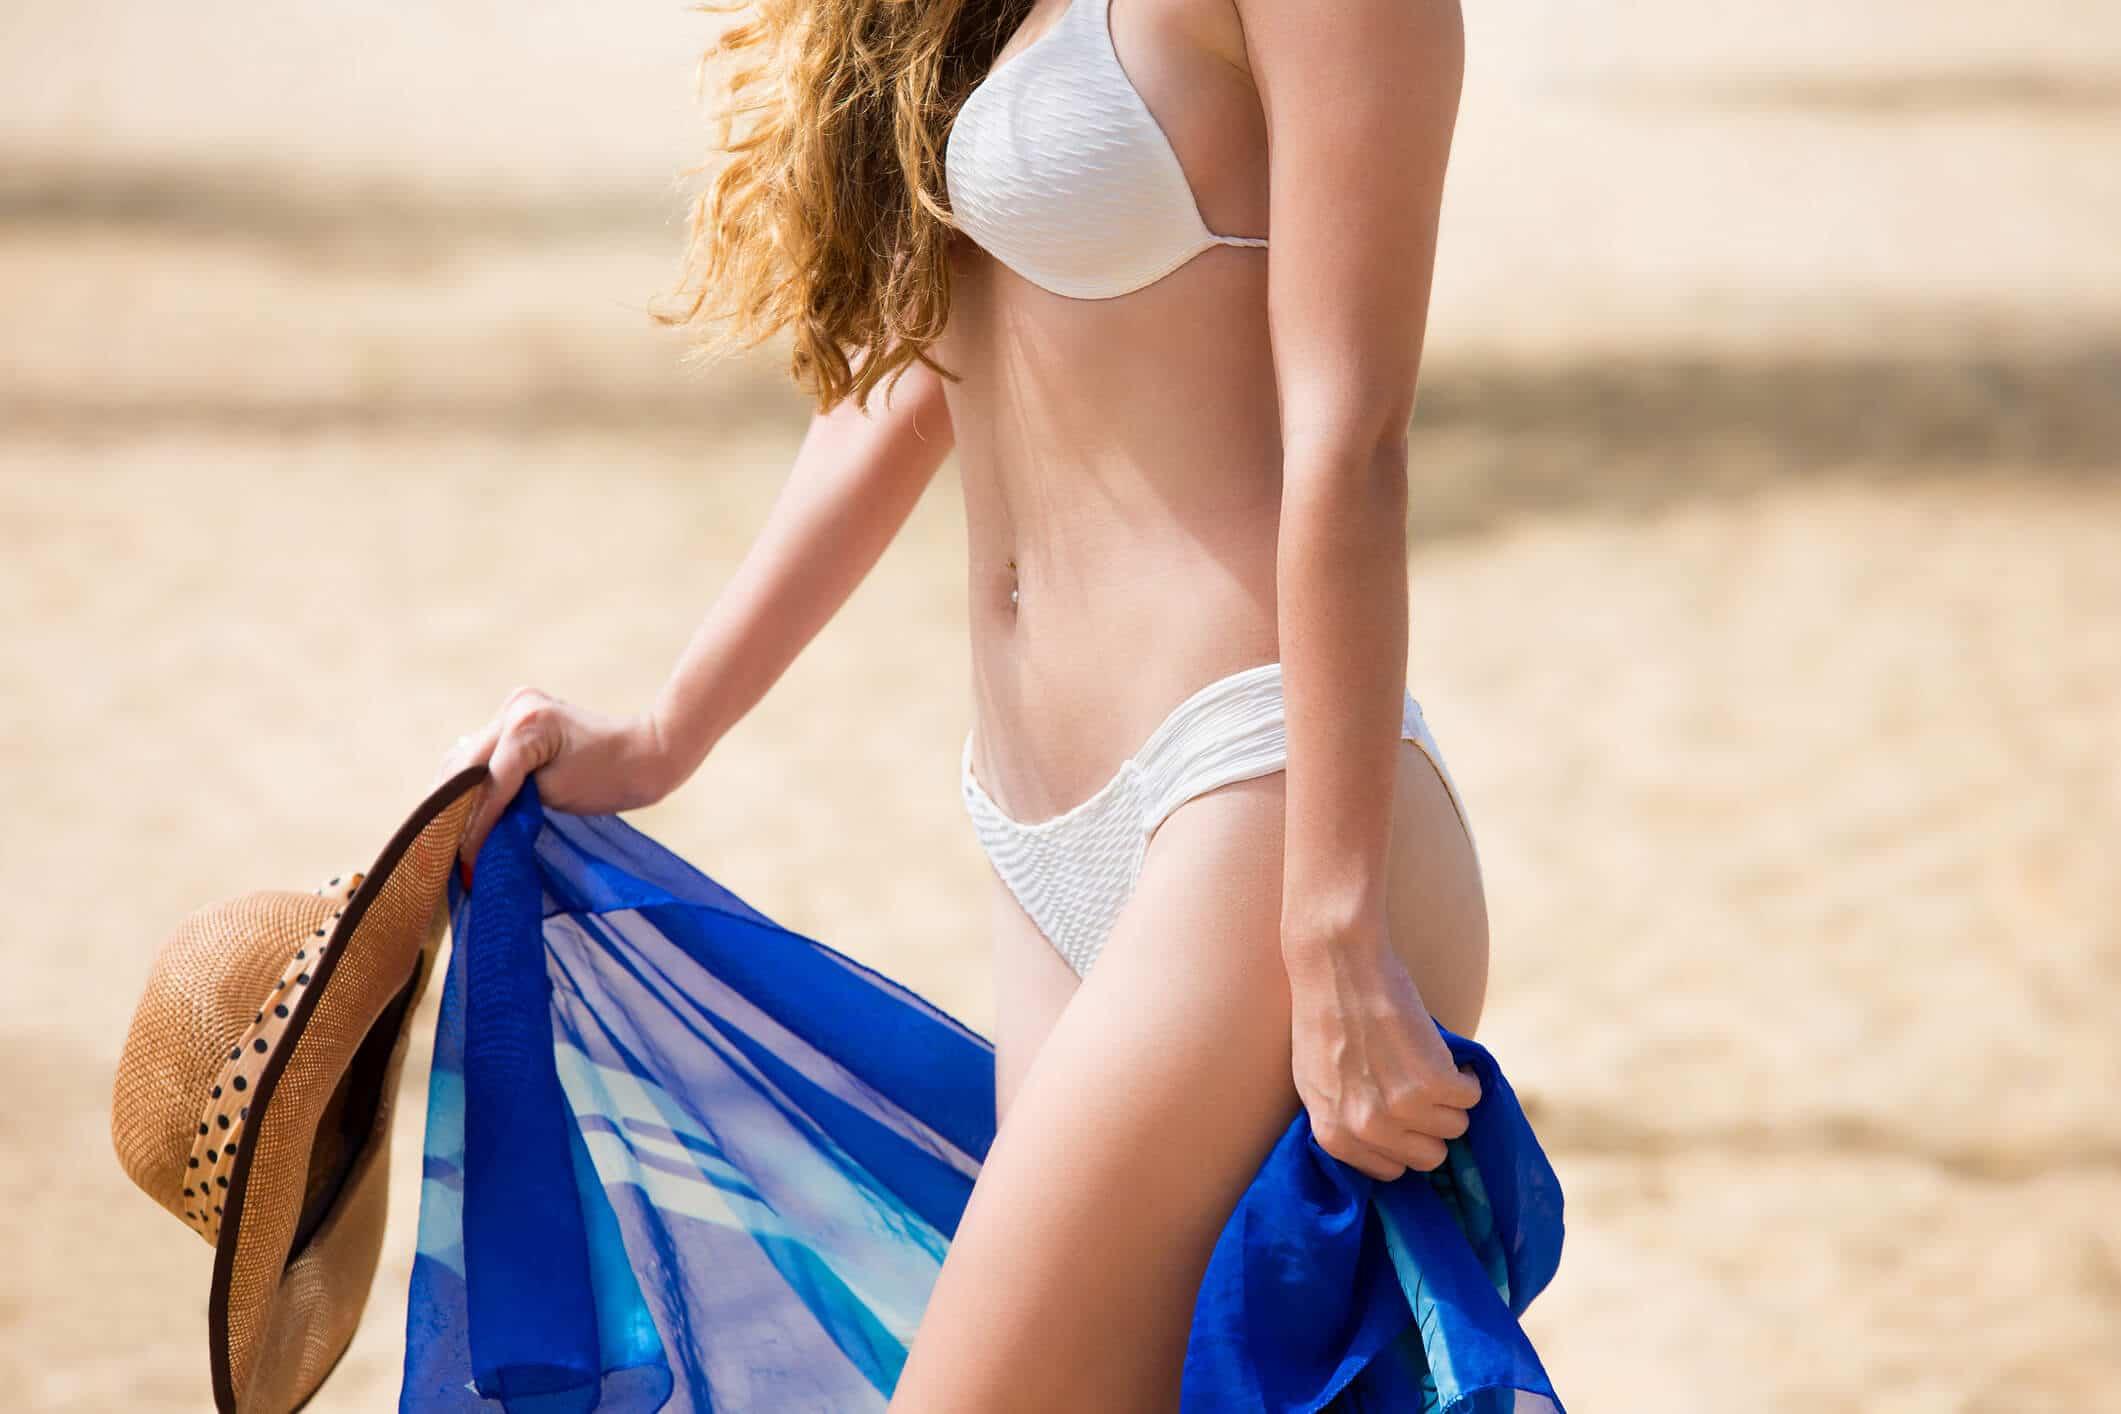 como usar canga de praia